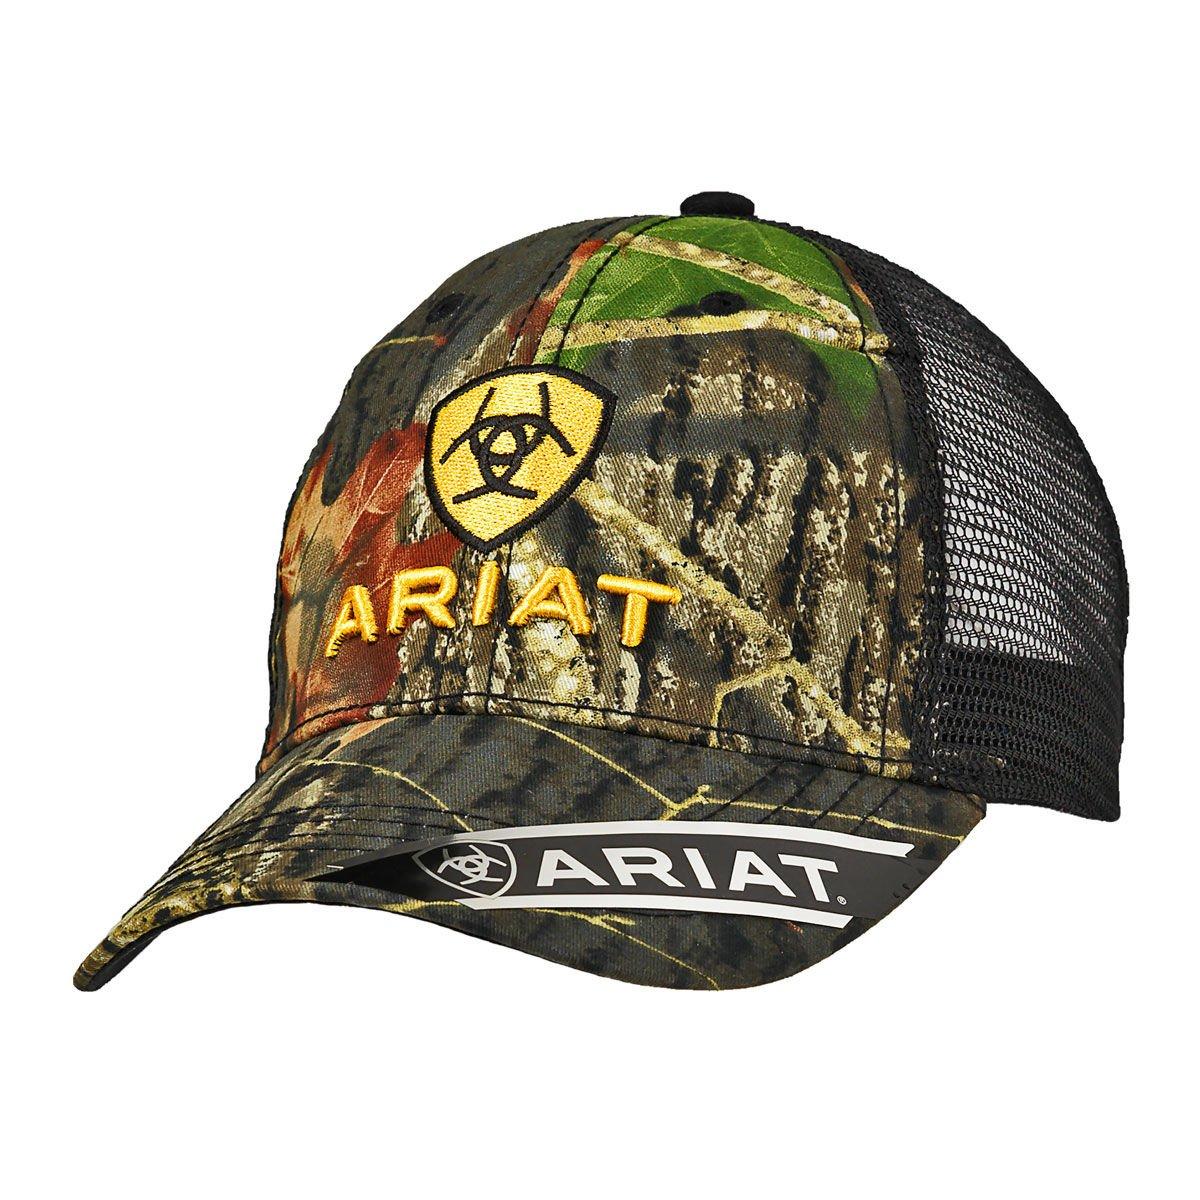 Ariat Men's Camo Front Black Mesh Hat, Green, One Size